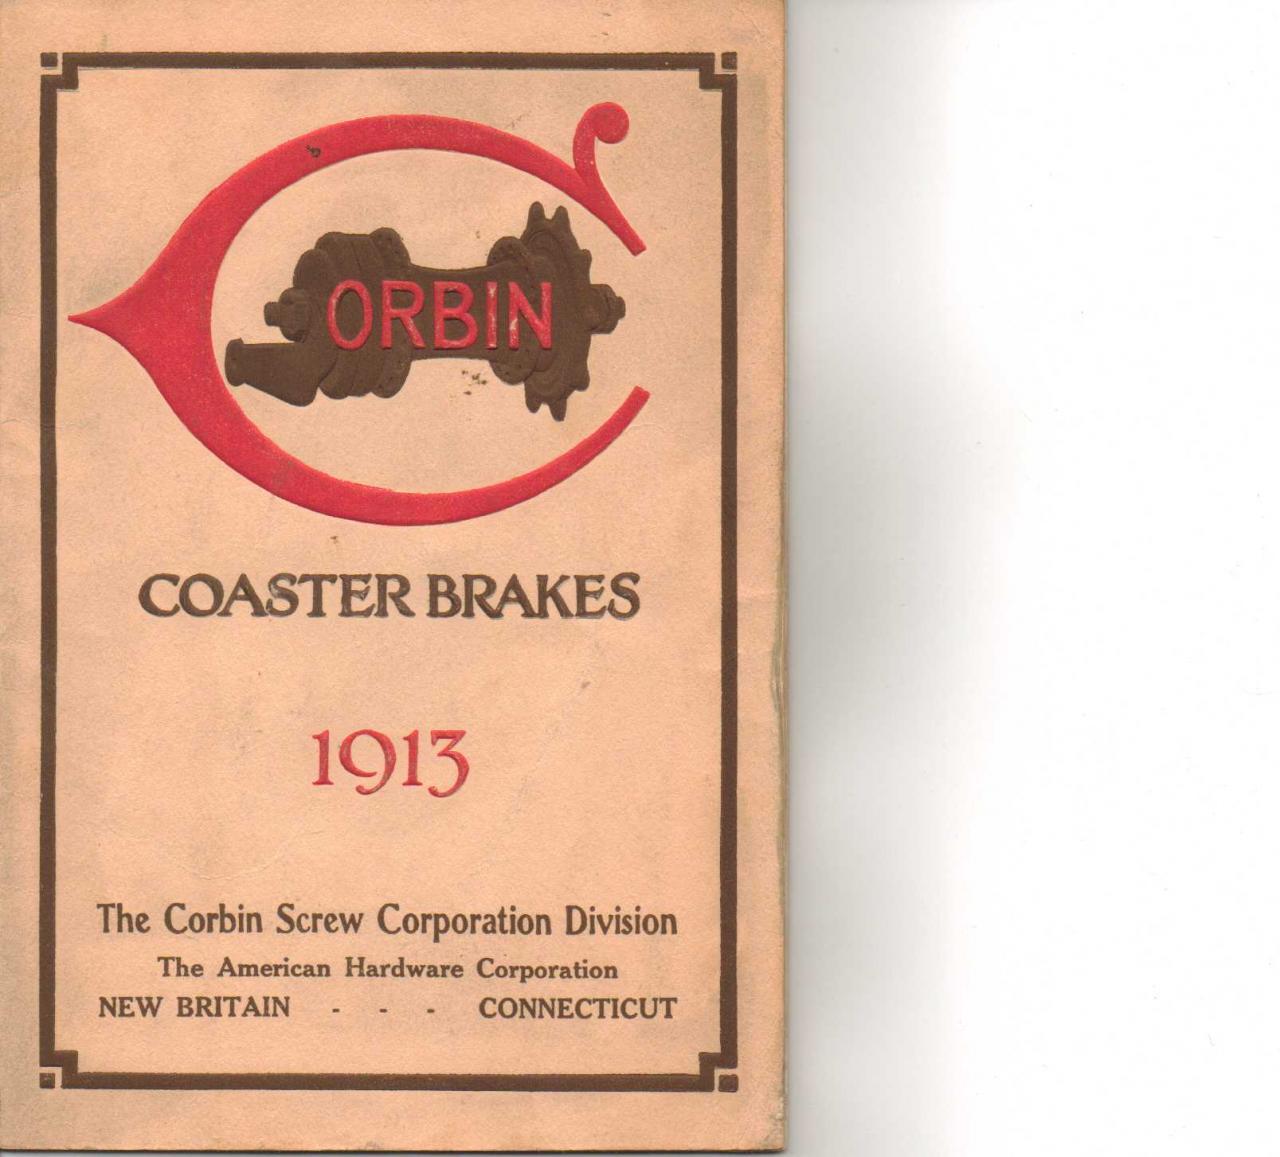 Corbin Catalogs2.jpg